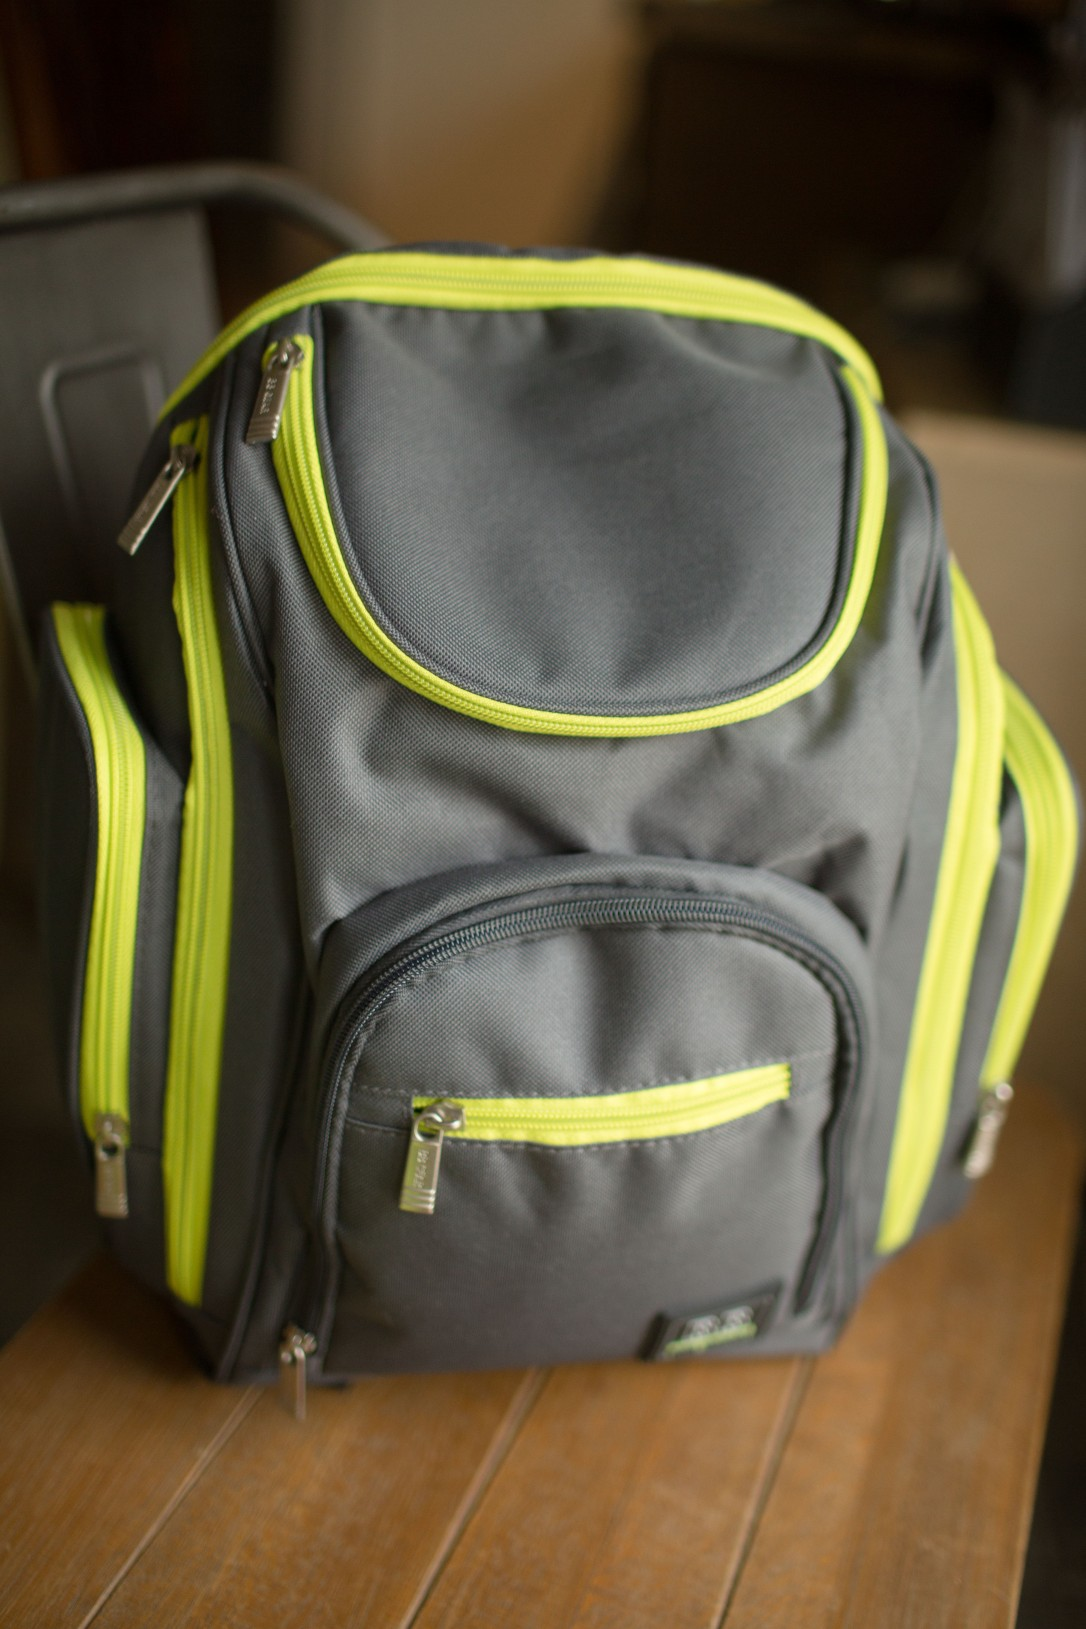 backpack diaper bag, gender neutral, unisex